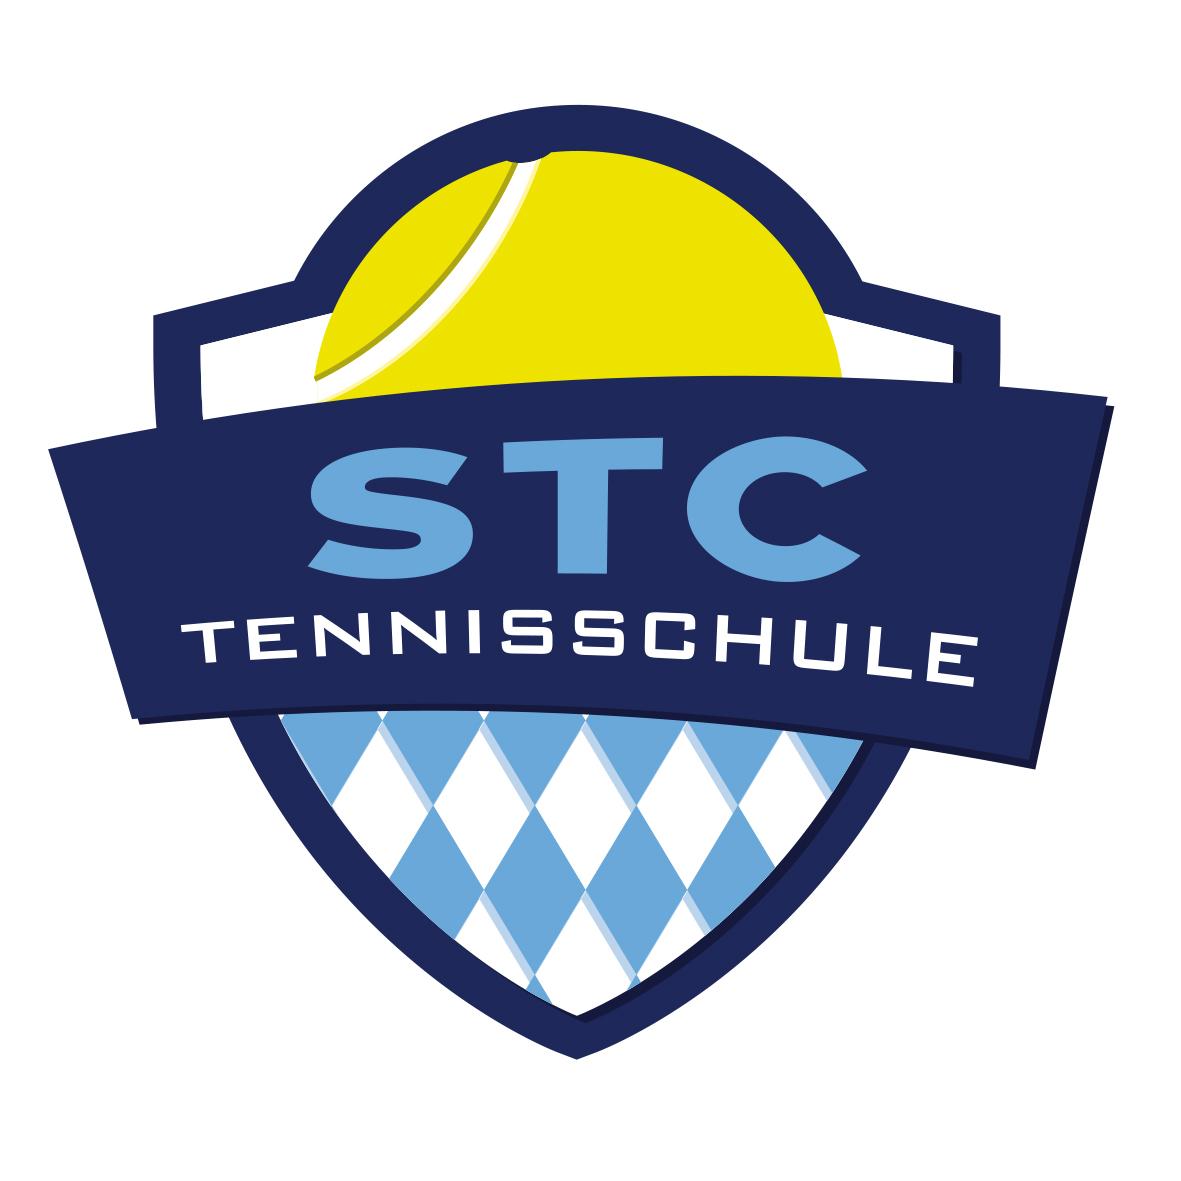 STC Tennisschule München